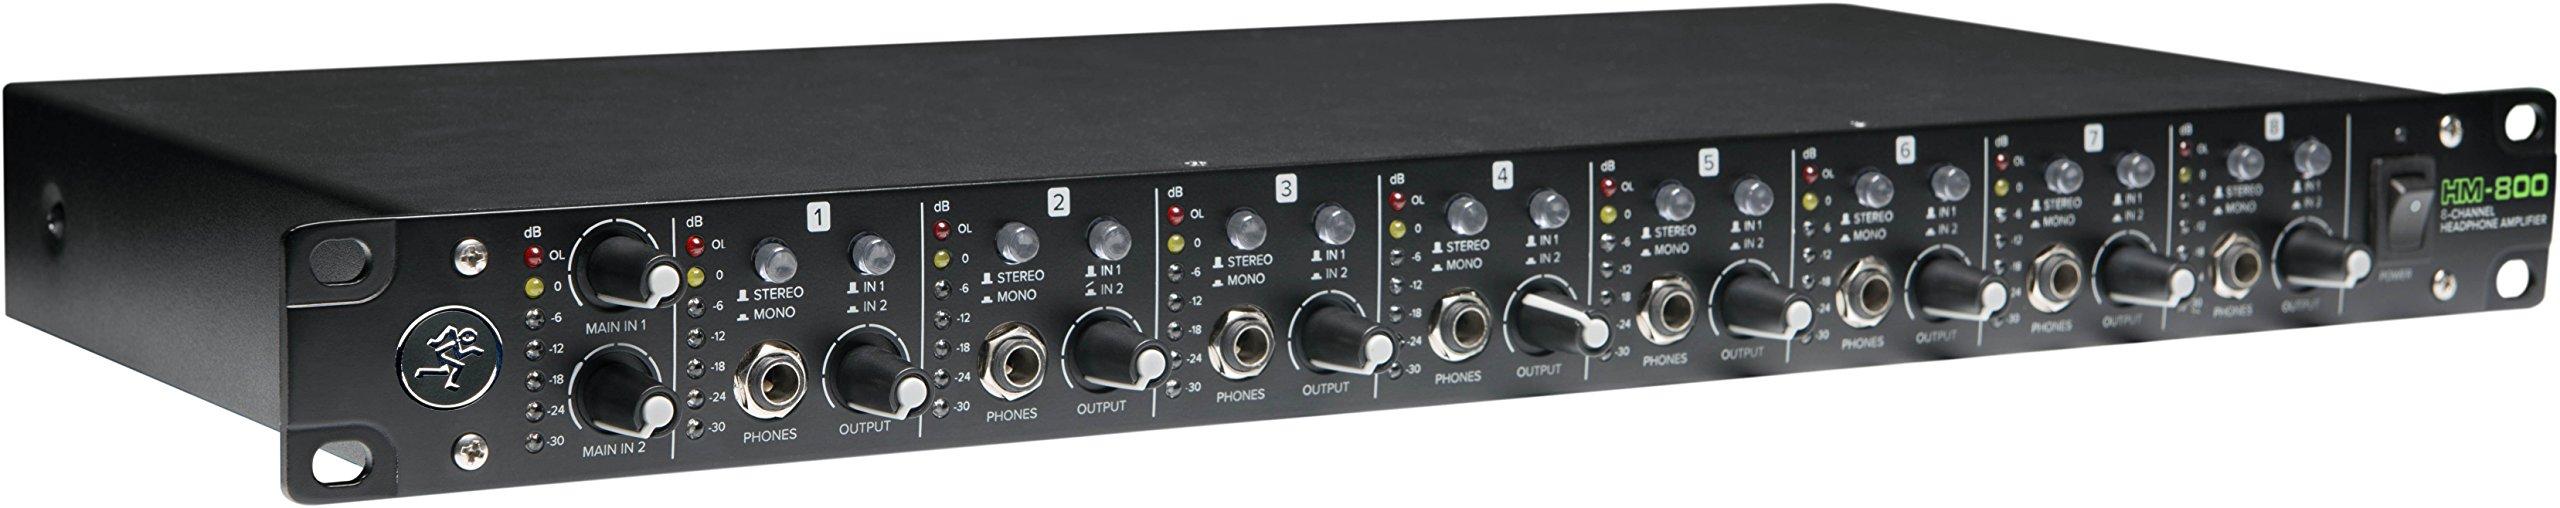 Mackie Mixer Accessory (HM800)